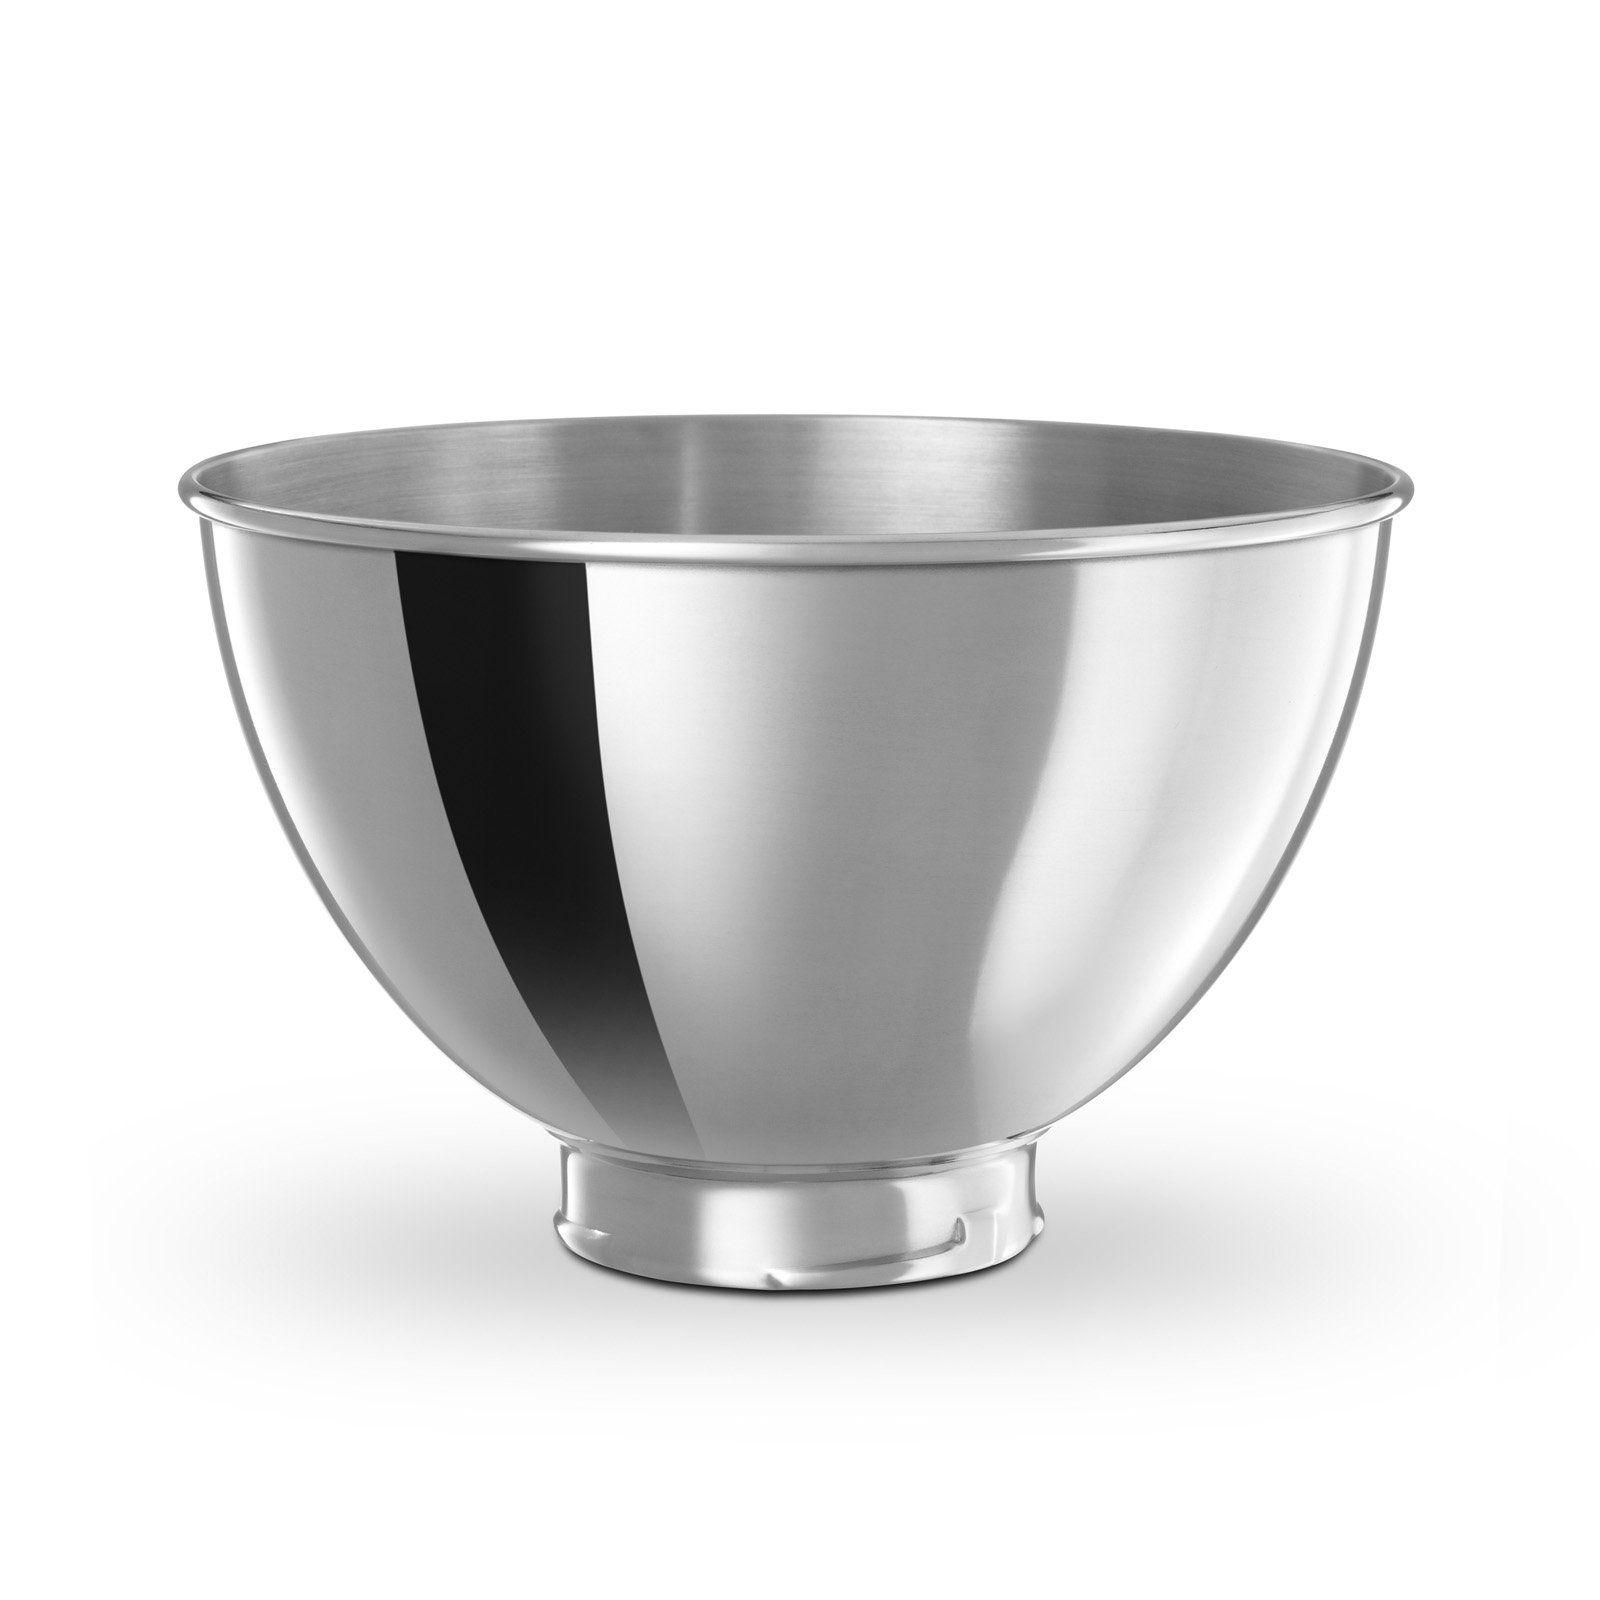 Kitchenaid 3 Qt Polished Stainless Steel Bowl Stainless Steel Mixing Bowls Kitchen Aid Stainless Steel Bowl